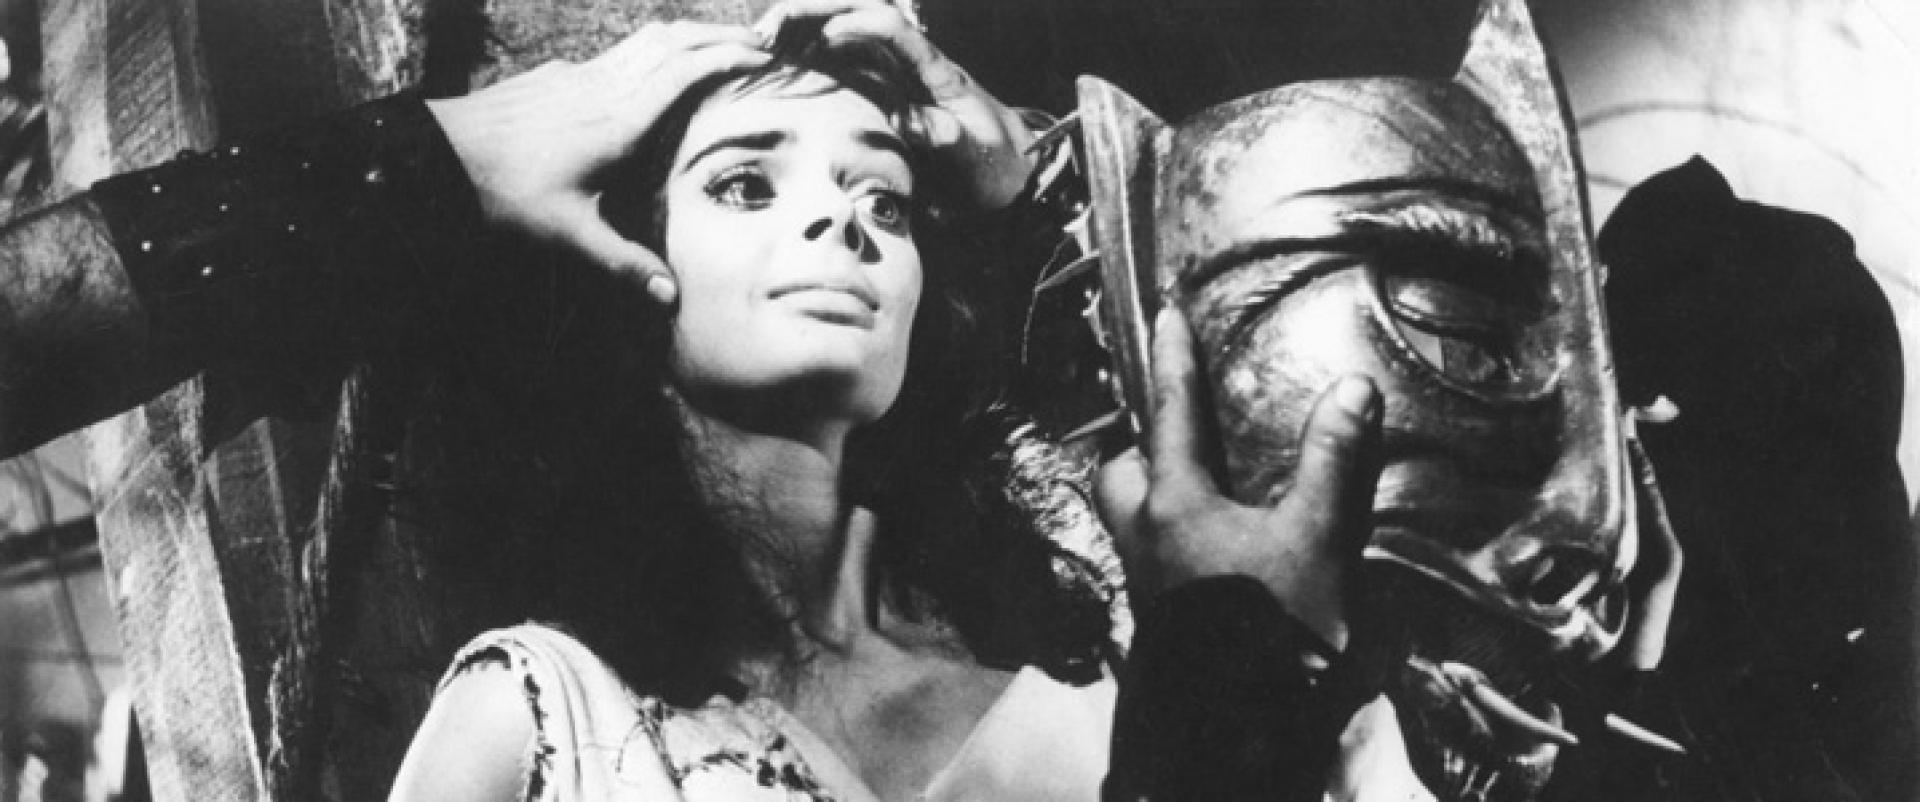 La maschera del demonio - A démon maszkja (1960)